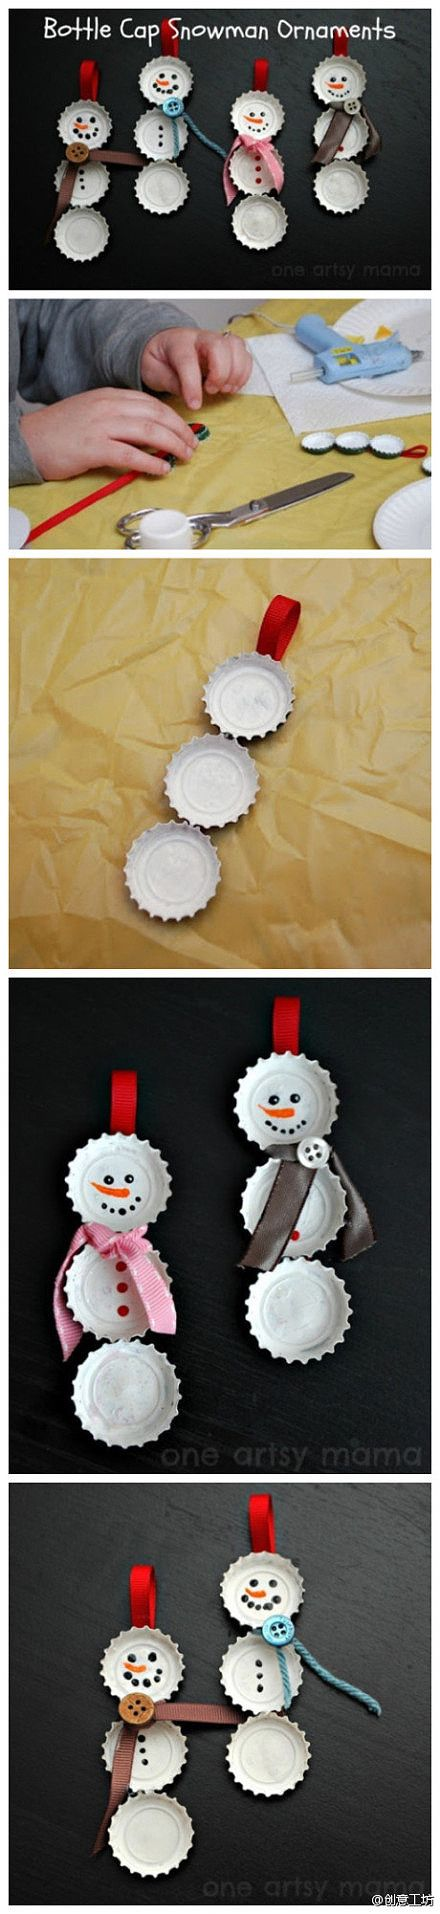 Bottle cap snowmen great idea for kids craft